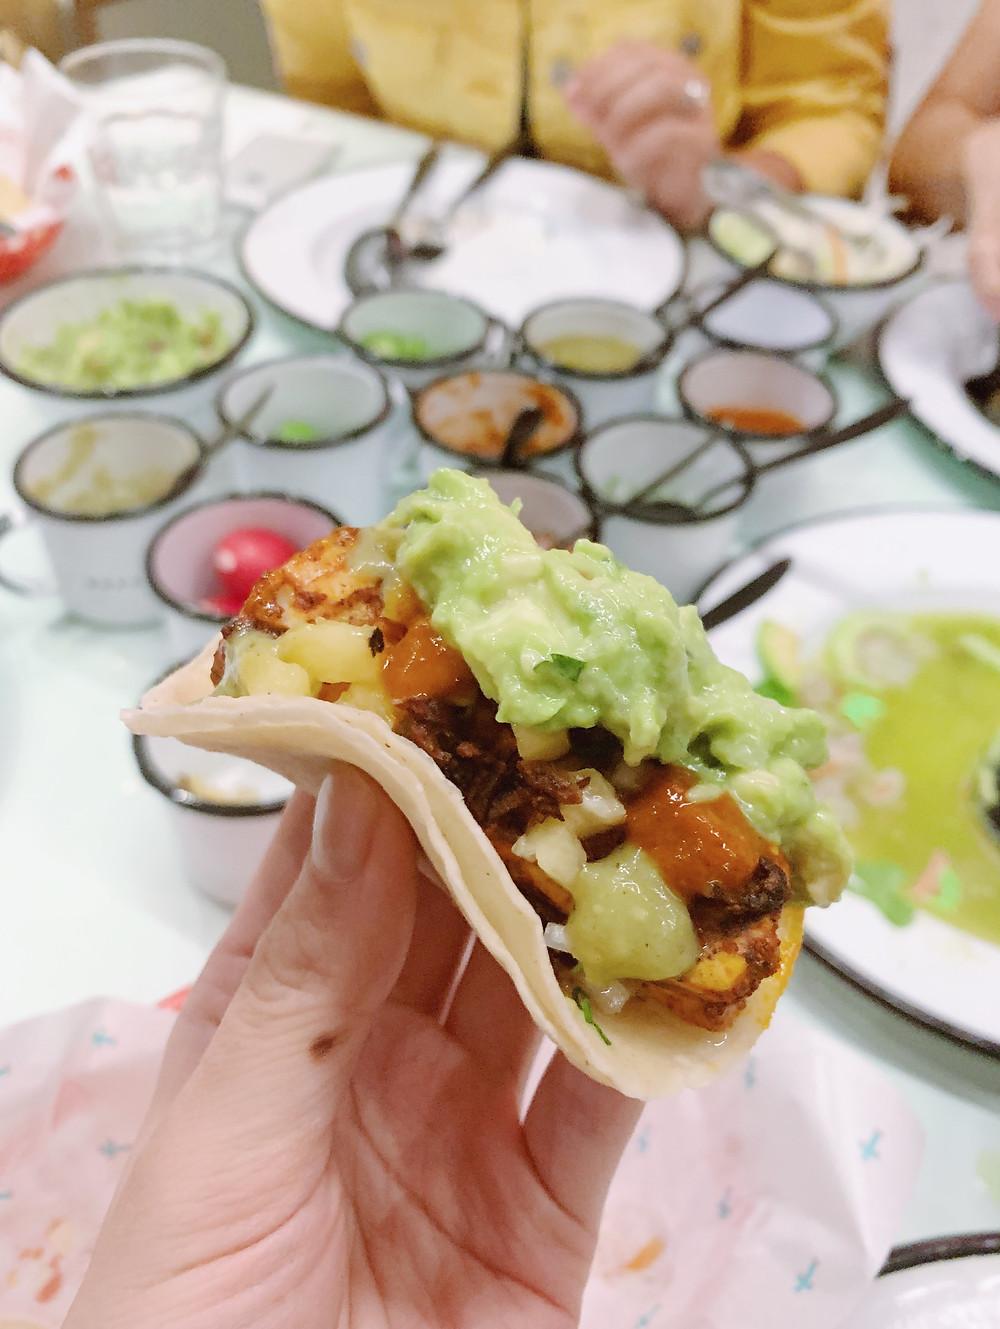 Food at Taqueria Super Macho Mexican restaurant in Hong Kong